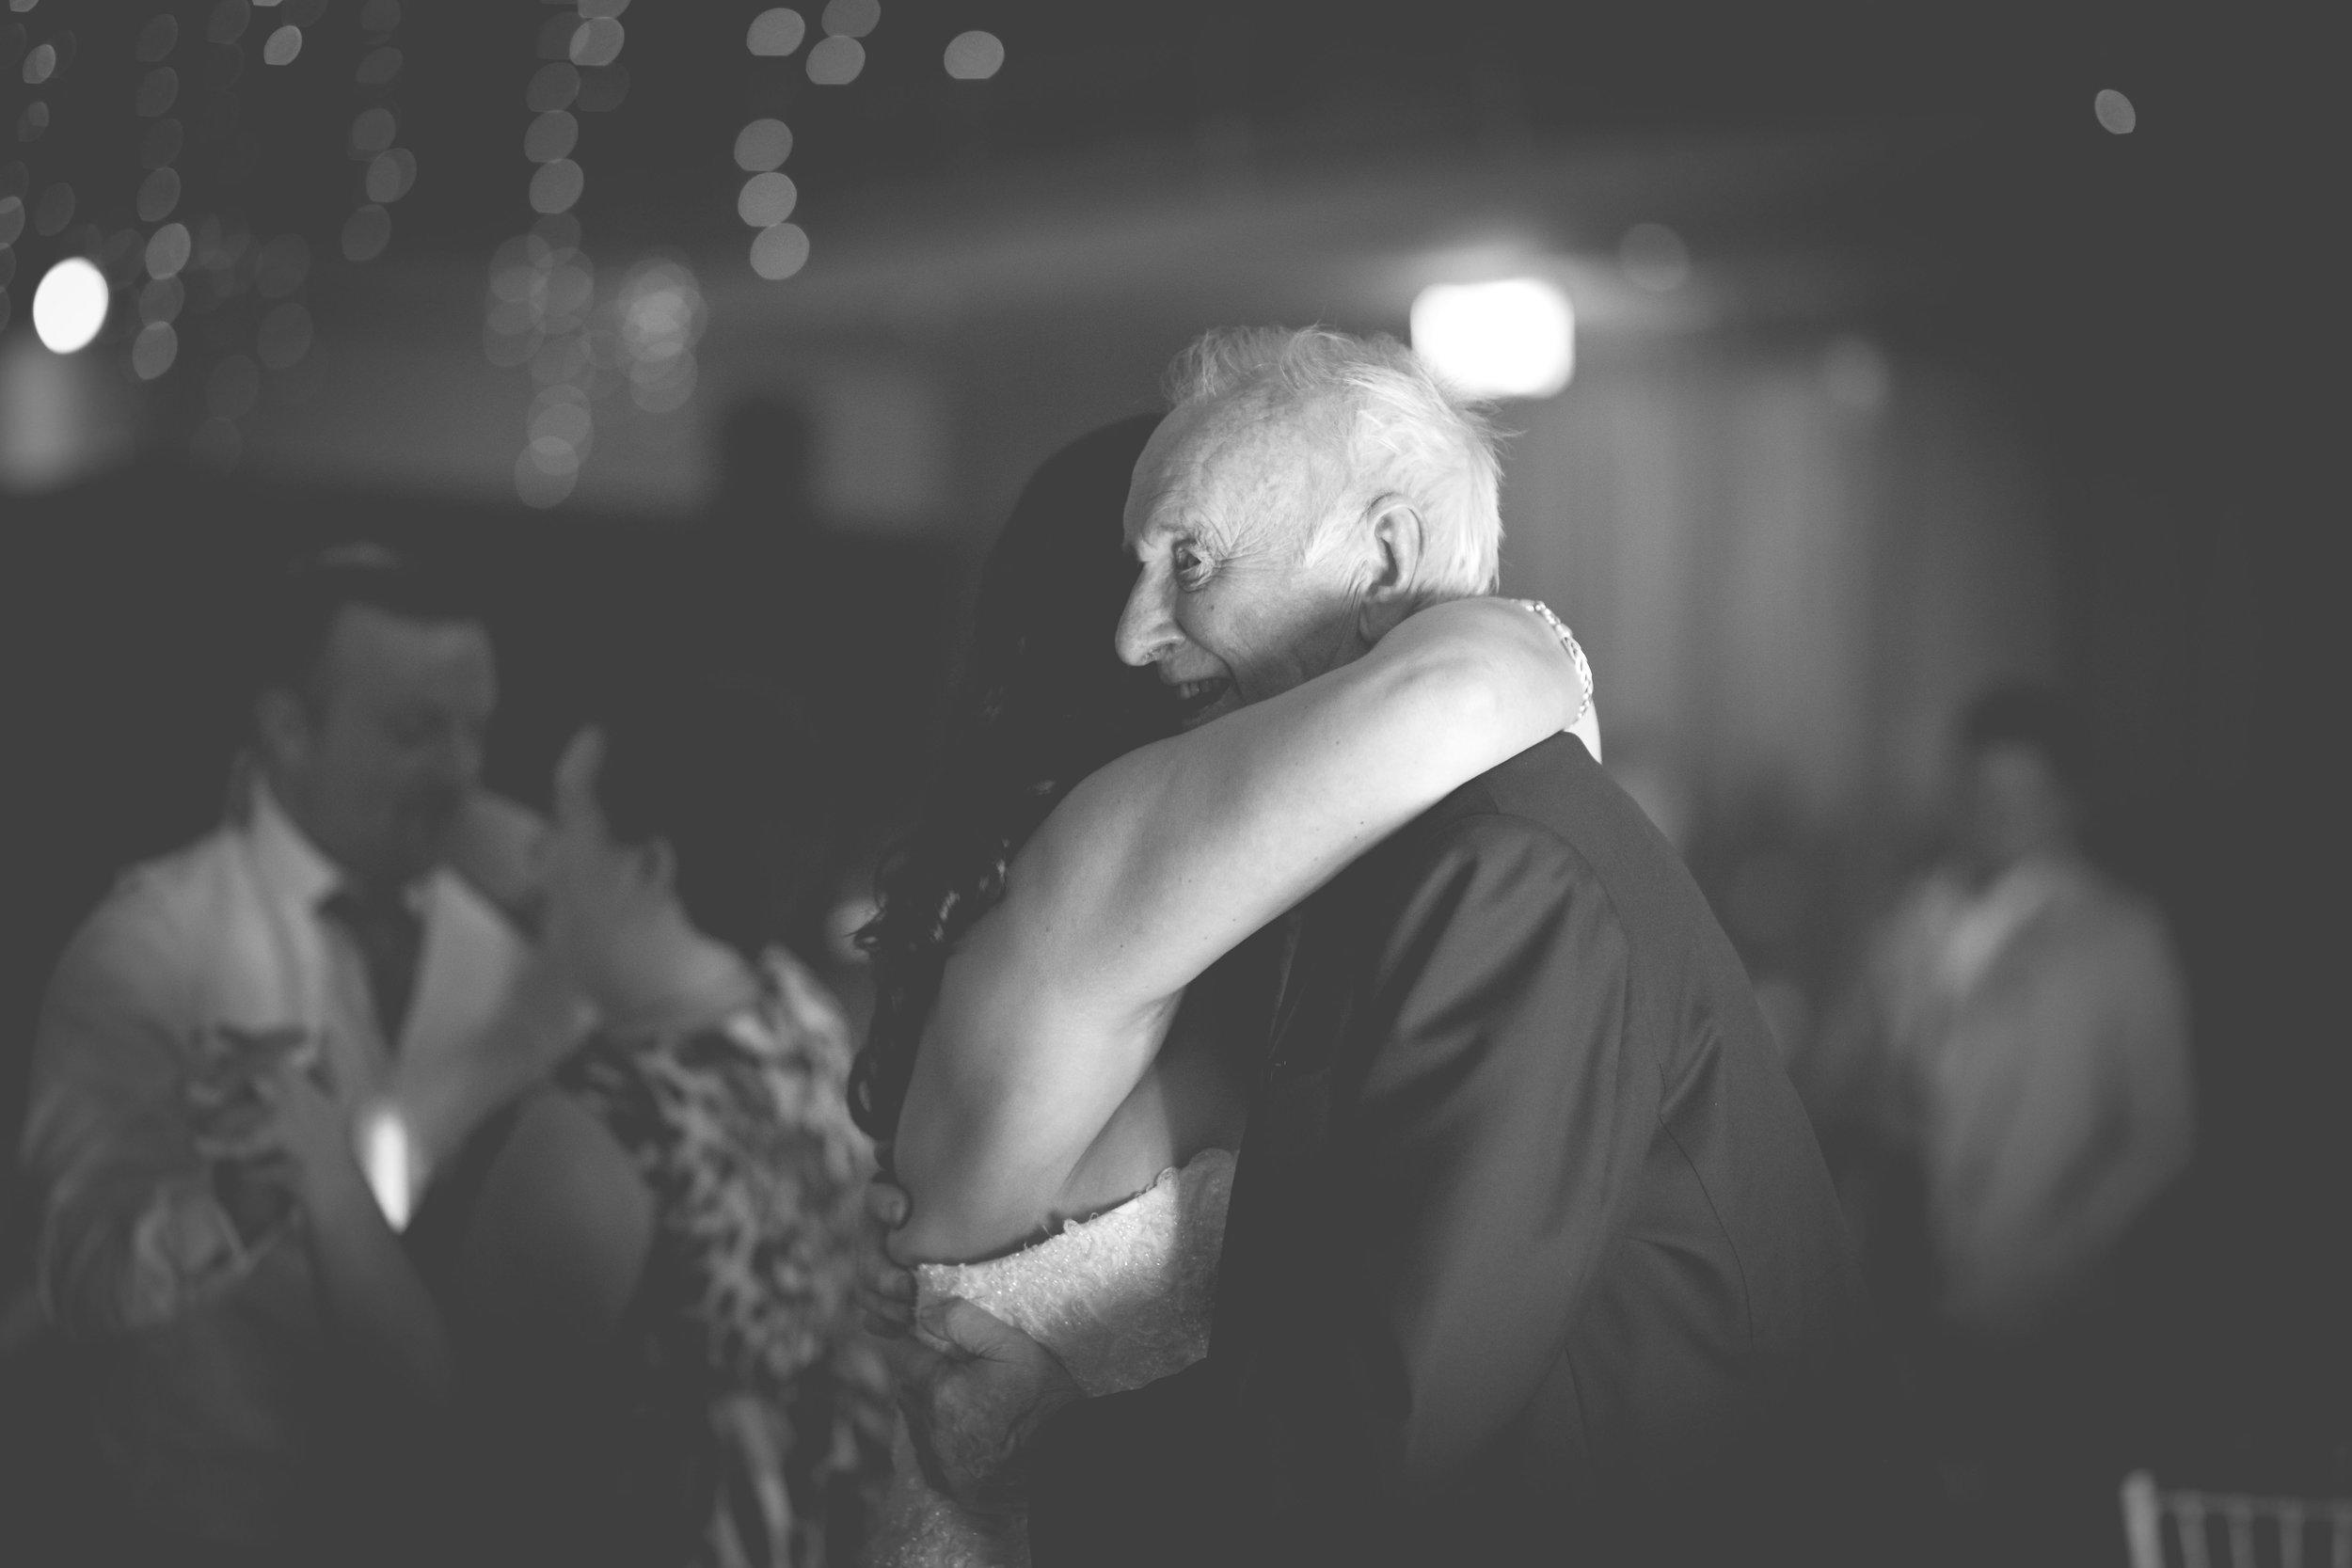 Northern Ireland Wedding Photographer   Brian McEwan Photography   Affordable Wedding Photography Throughout Antrim Down Armagh Tyrone Londonderry Derry Down Fermanagh -59.jpg